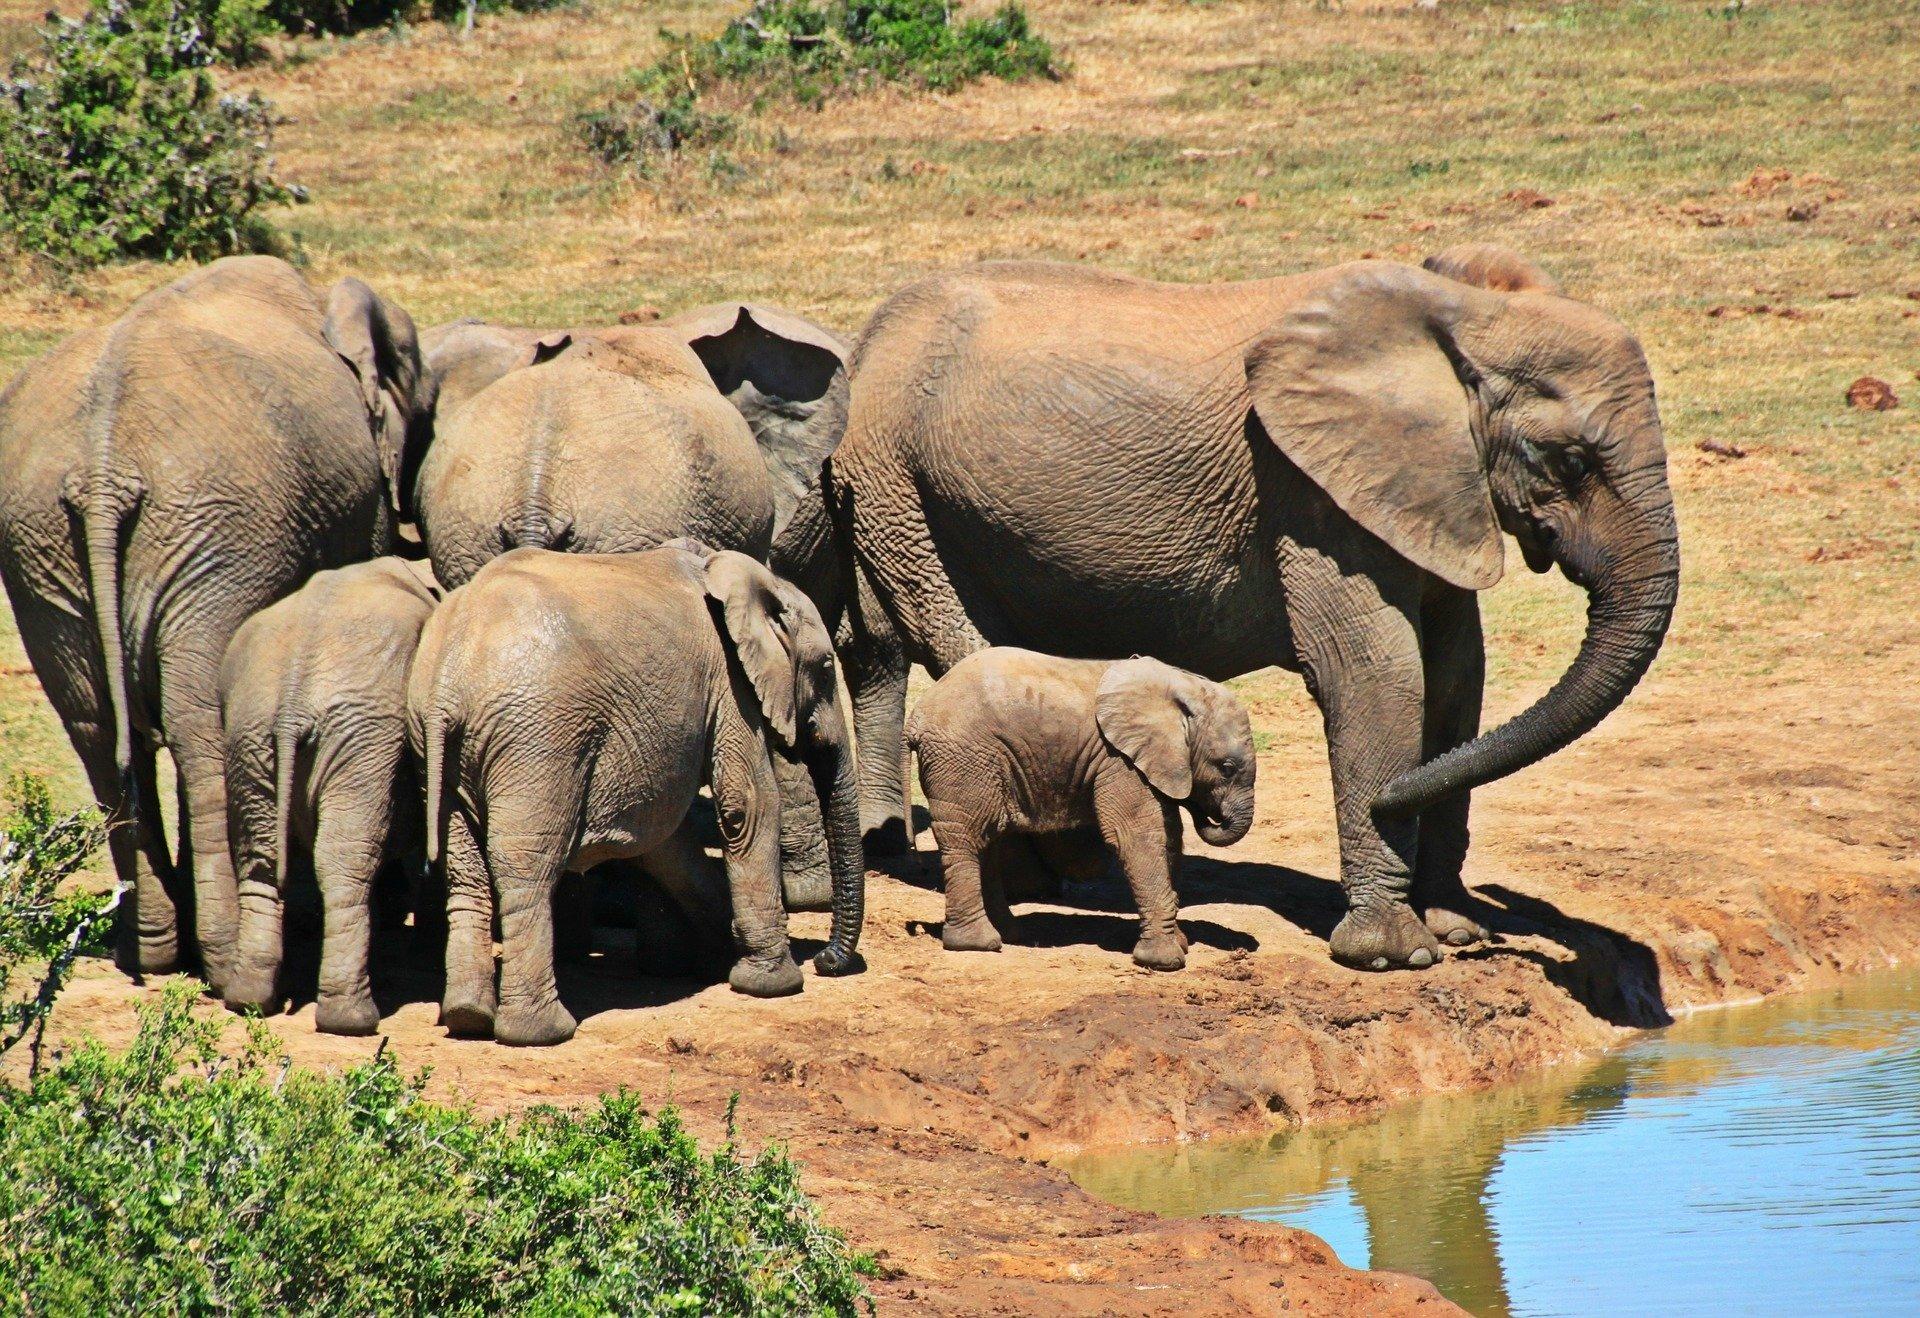 elephant-10925081920-1584026491.jpg